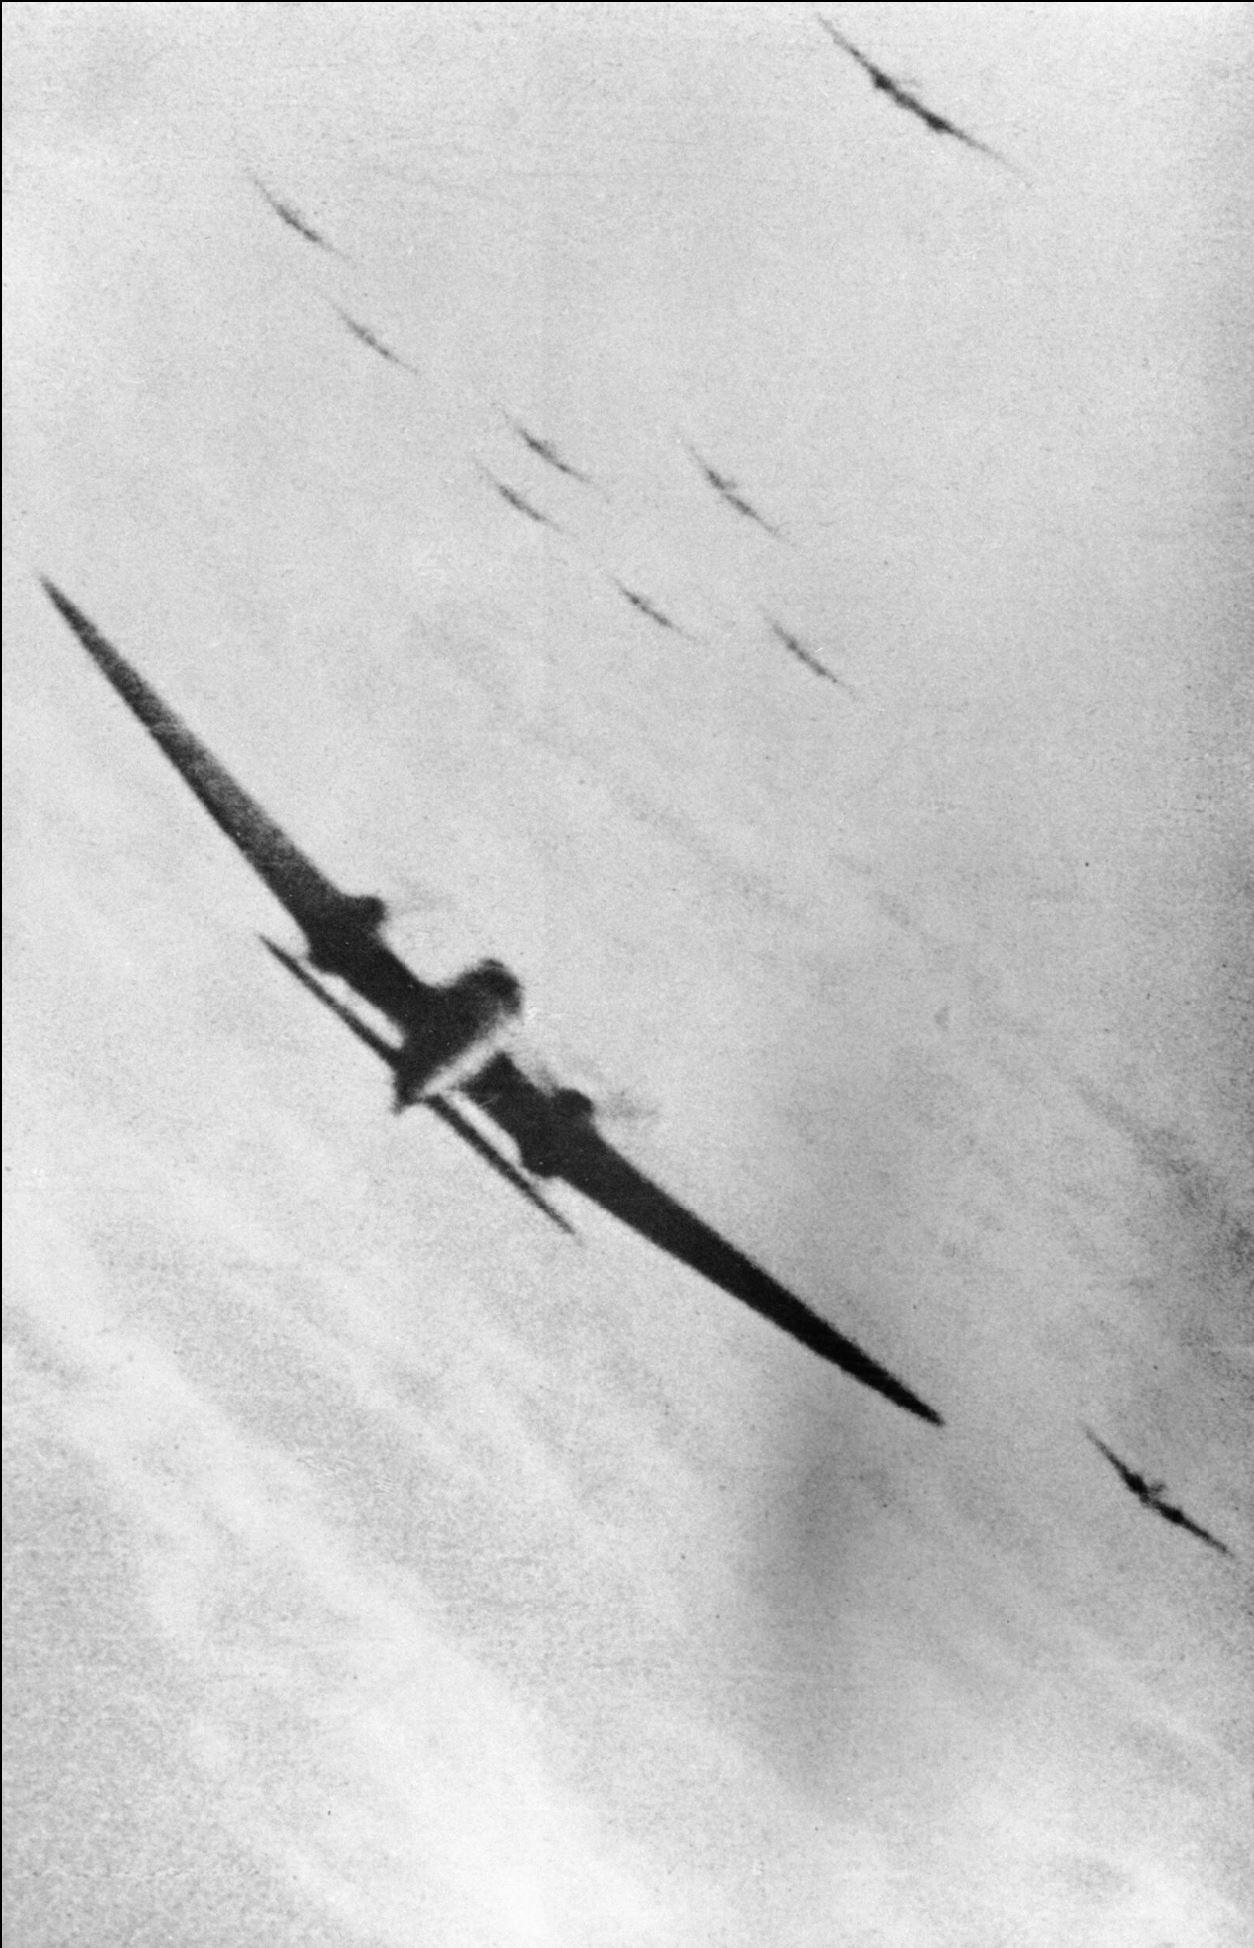 Gun camera footage from RAF 609Sqn Sqn Ldr Darley showing a KG55 He 111 being hit 1940 IWM CH1829